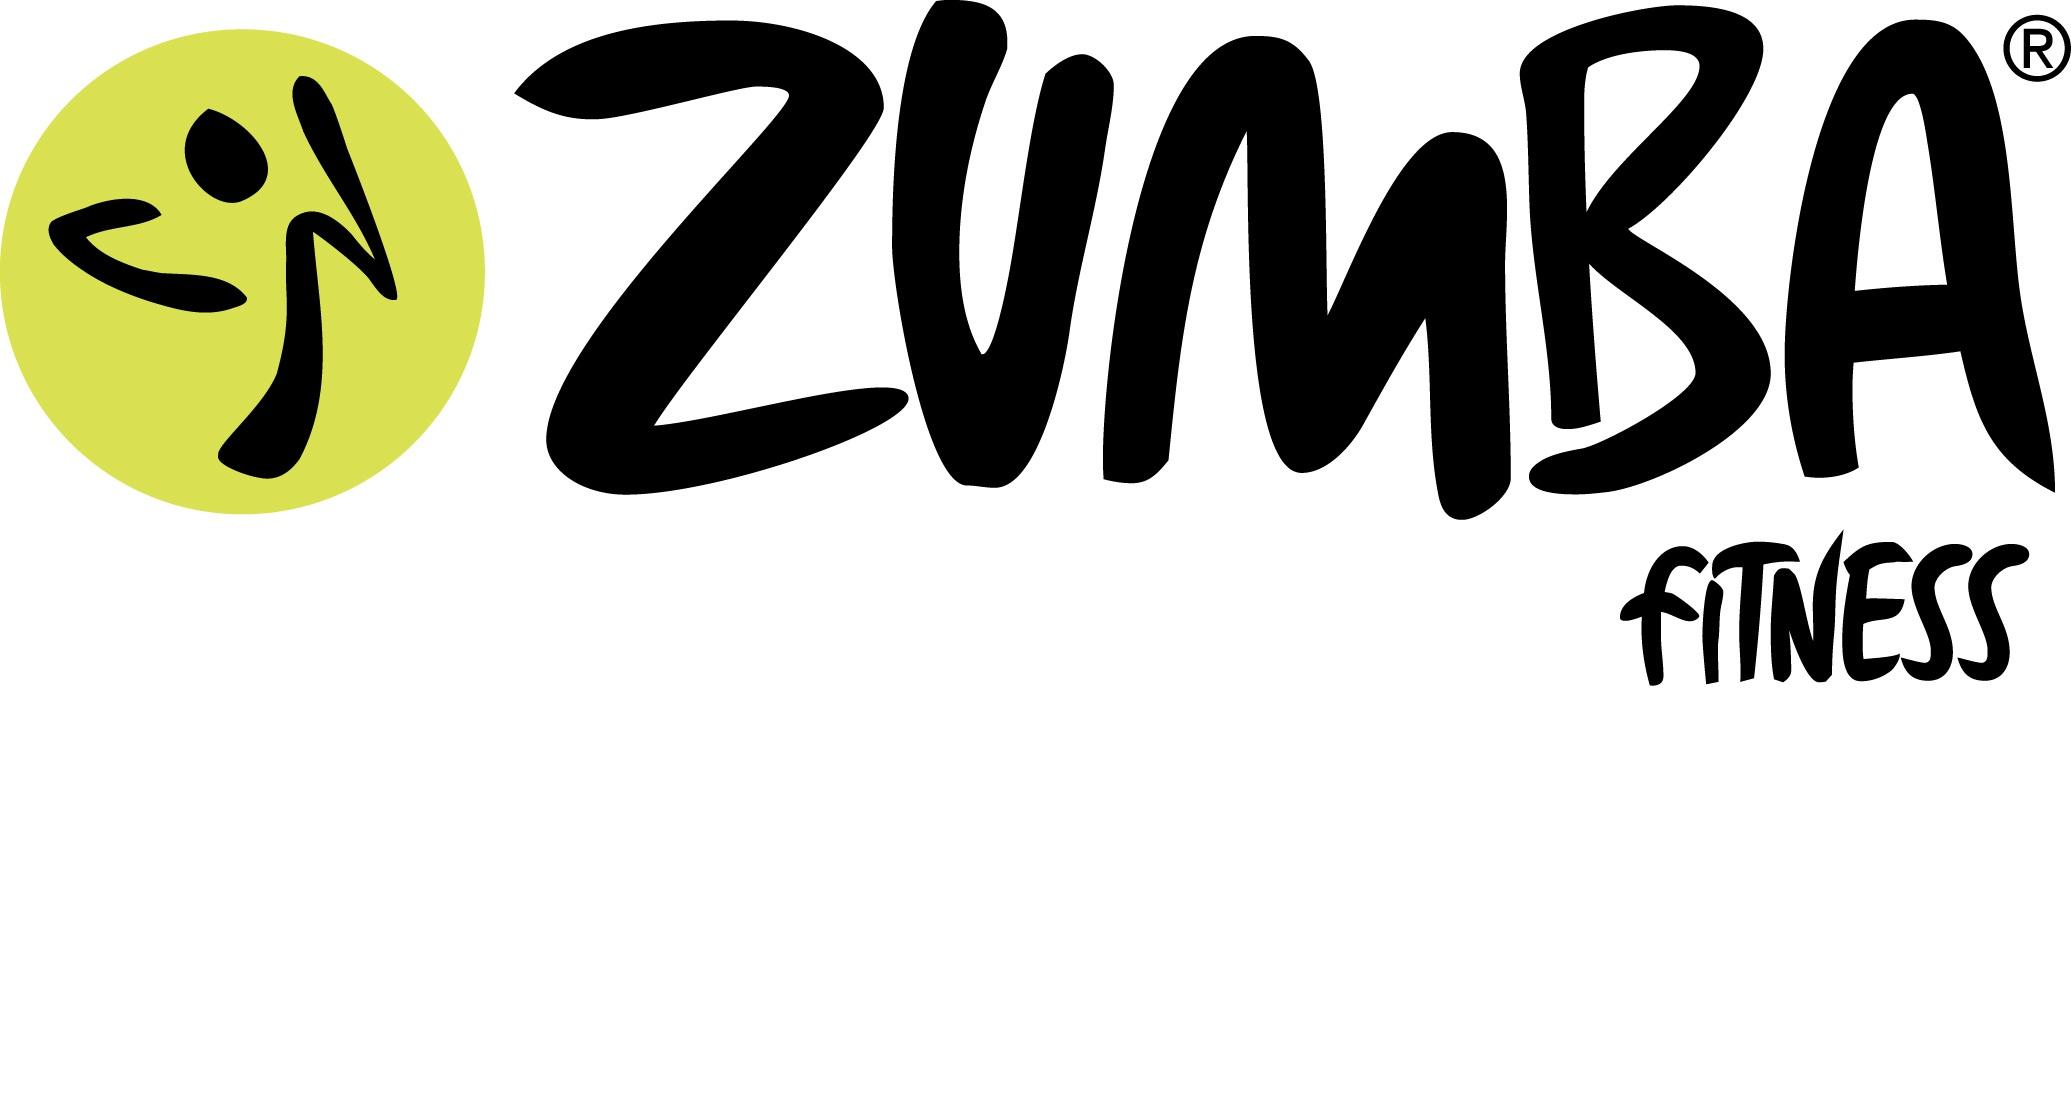 Zumba logo clipart 2 clipart